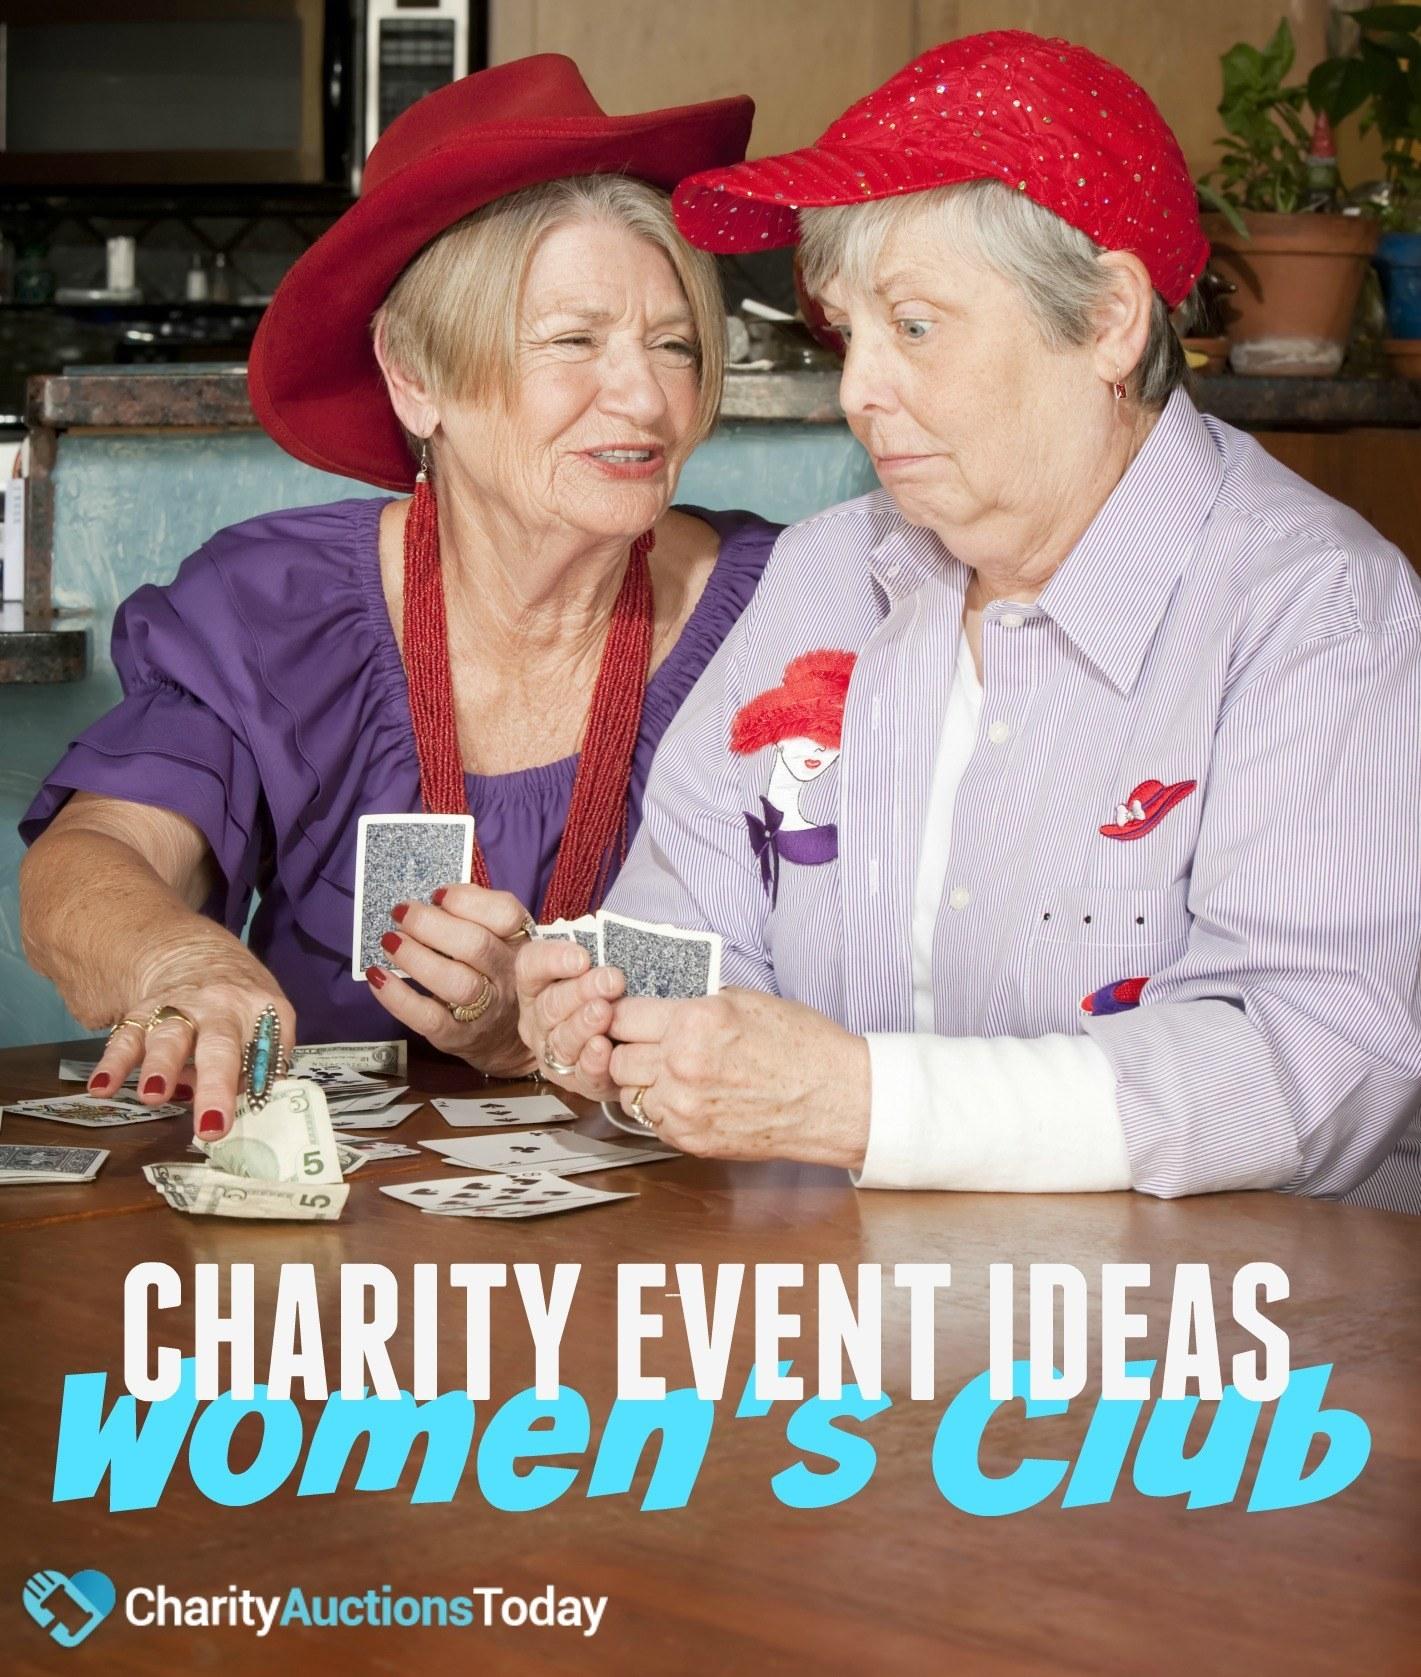 women u0026 39 s charity event ideas to raise money